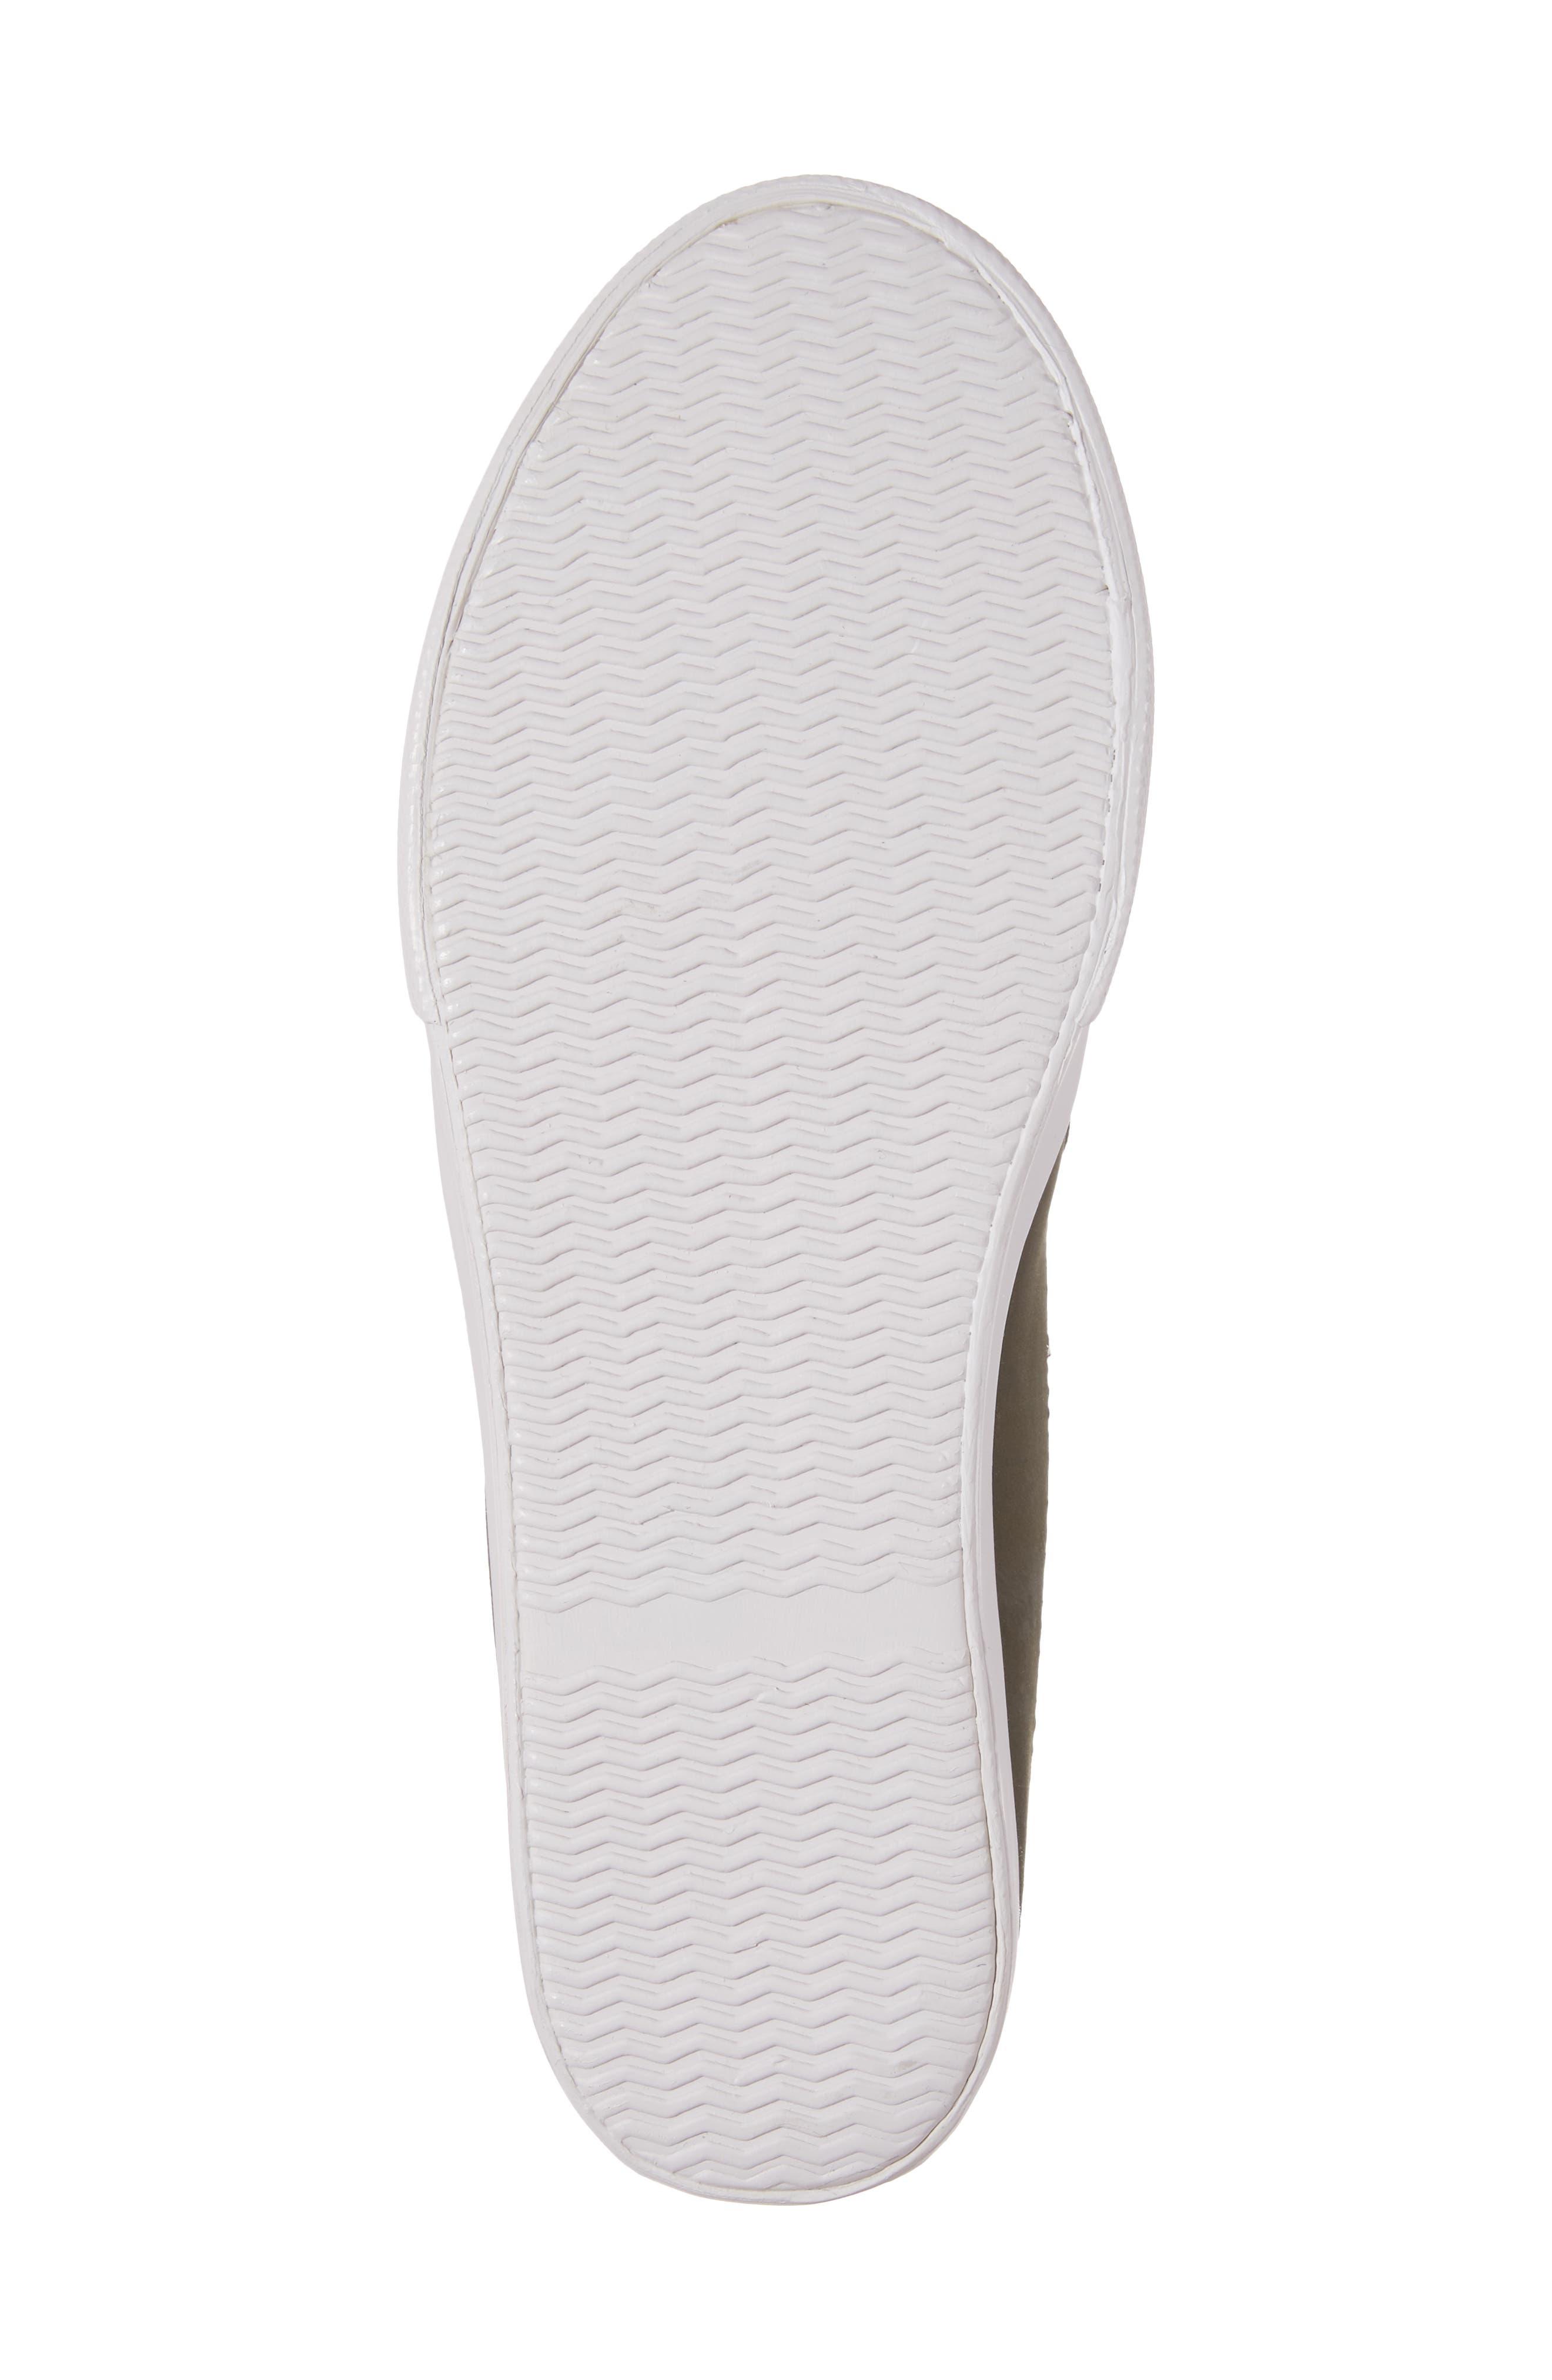 Tico Faux Fur Sneaker Mule,                             Alternate thumbnail 6, color,                             Olive Satin-Gold-Grey